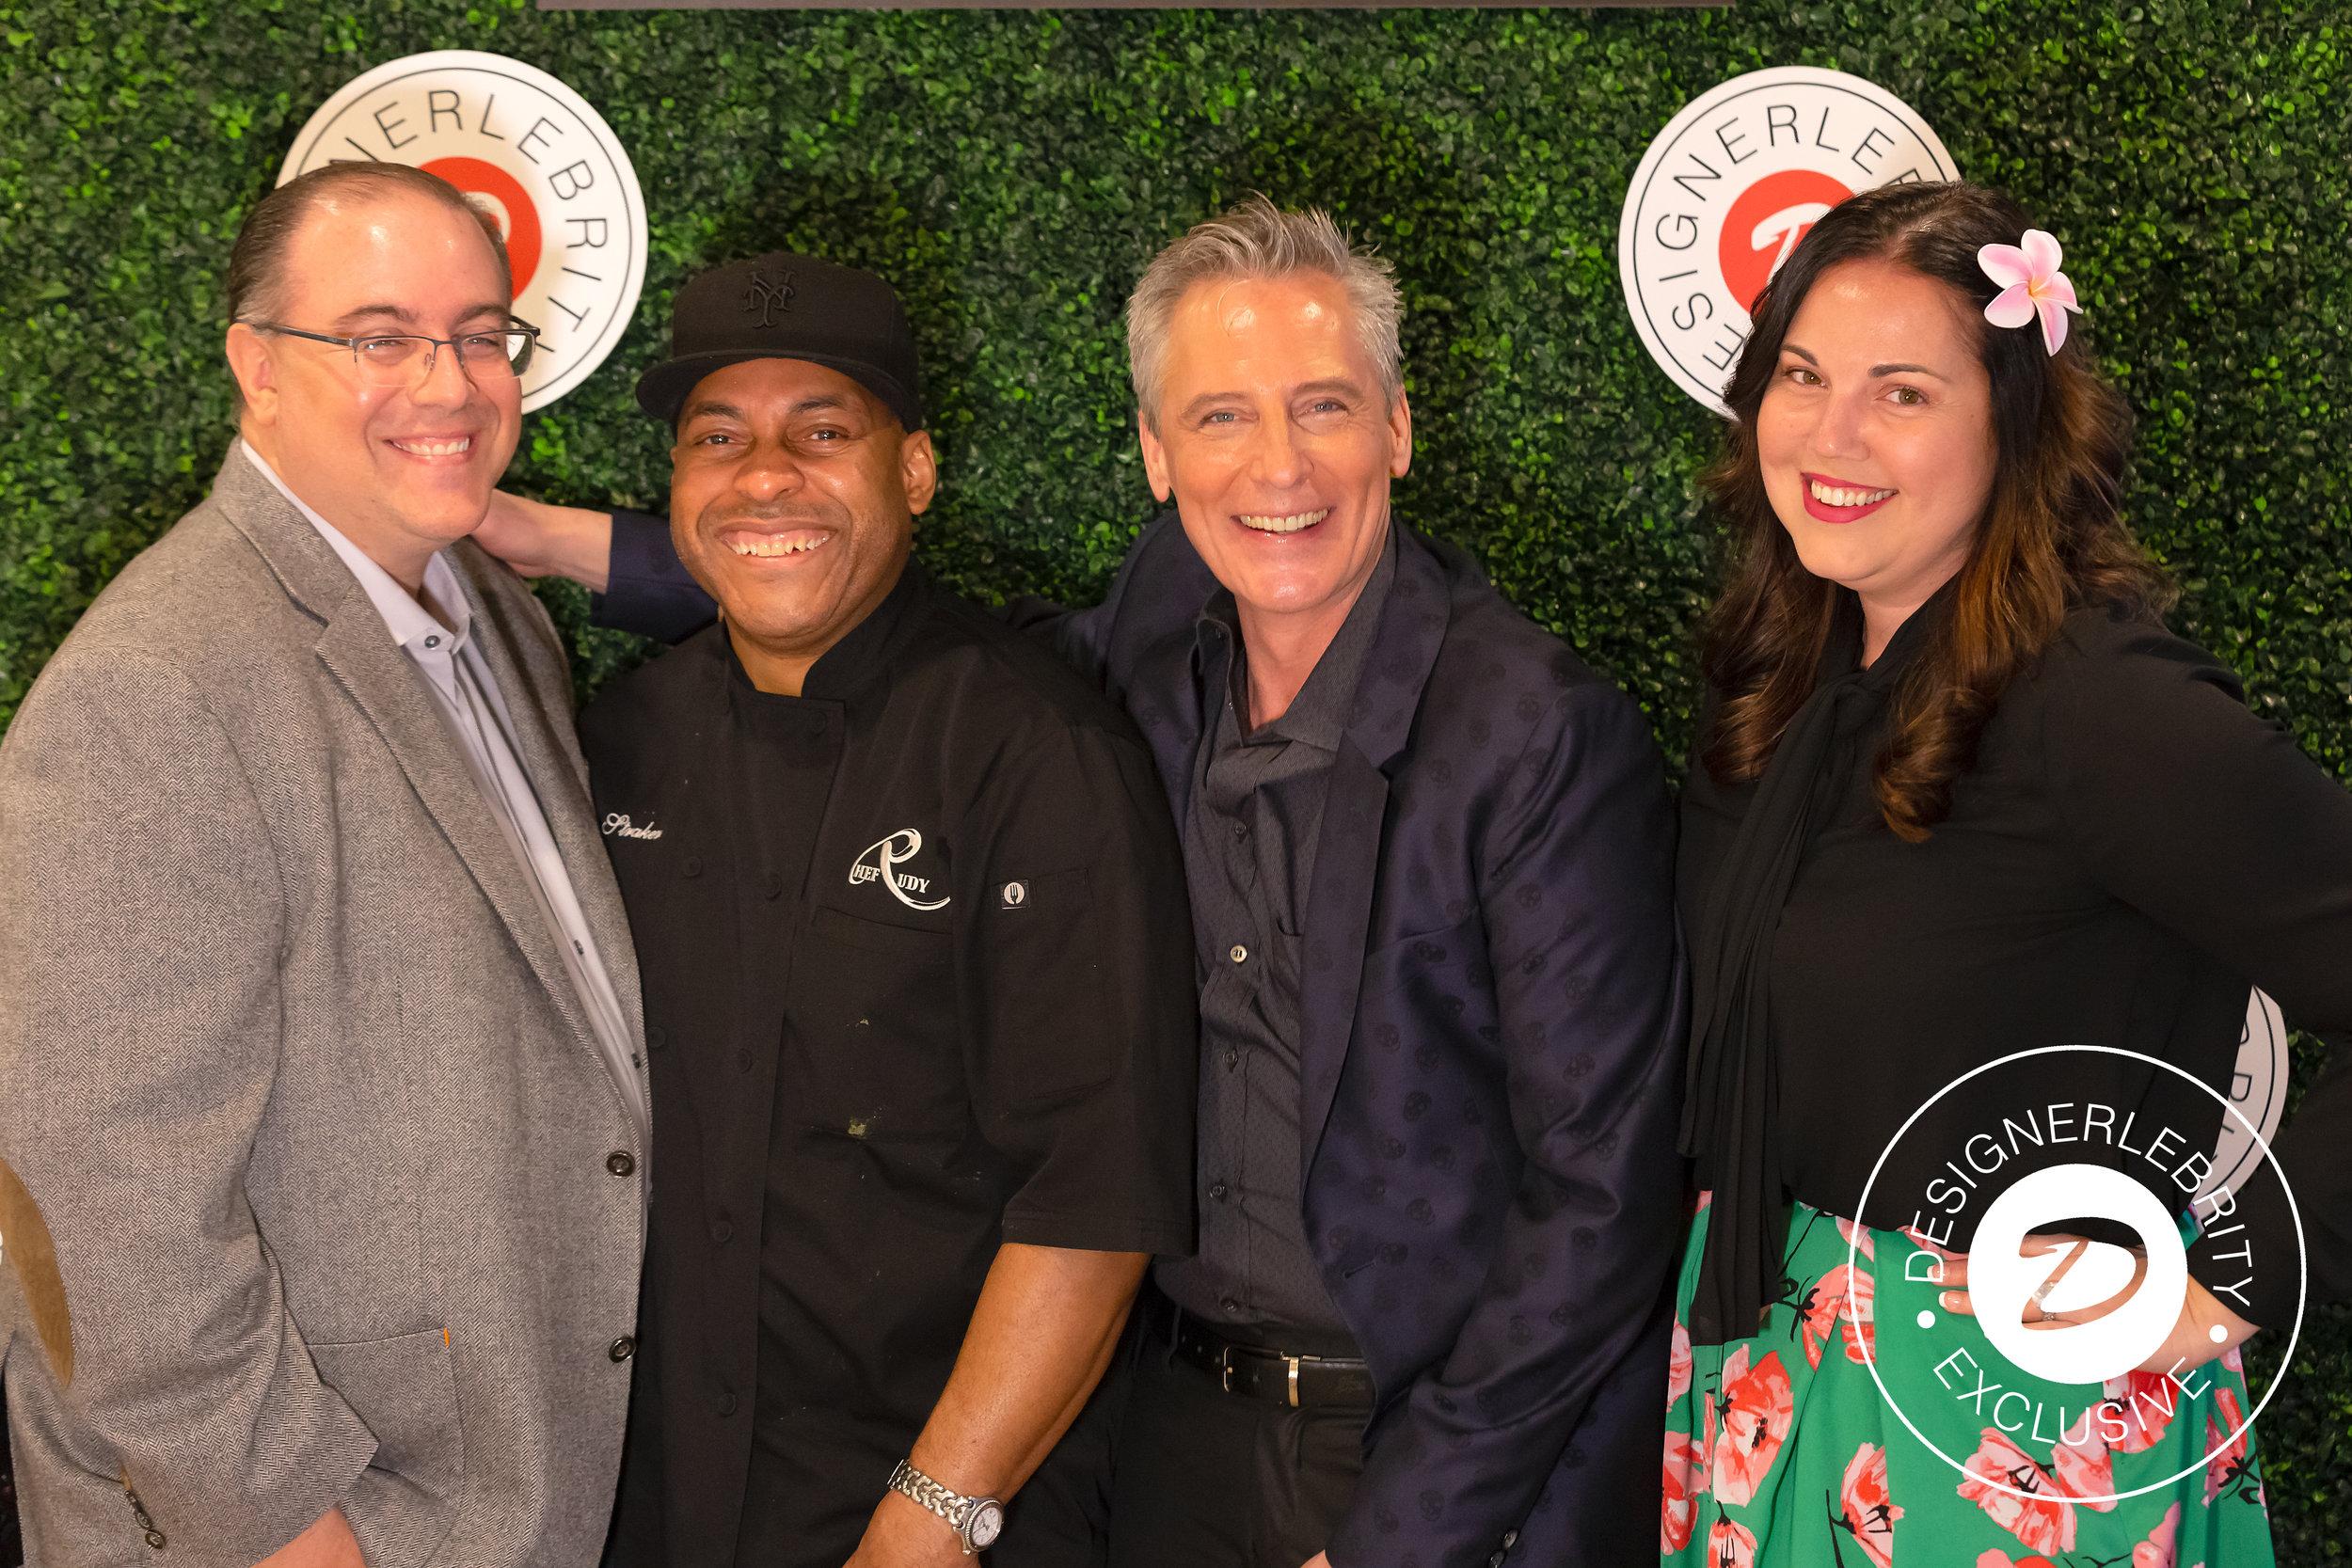 Celebrity Chef, Rudy Straker